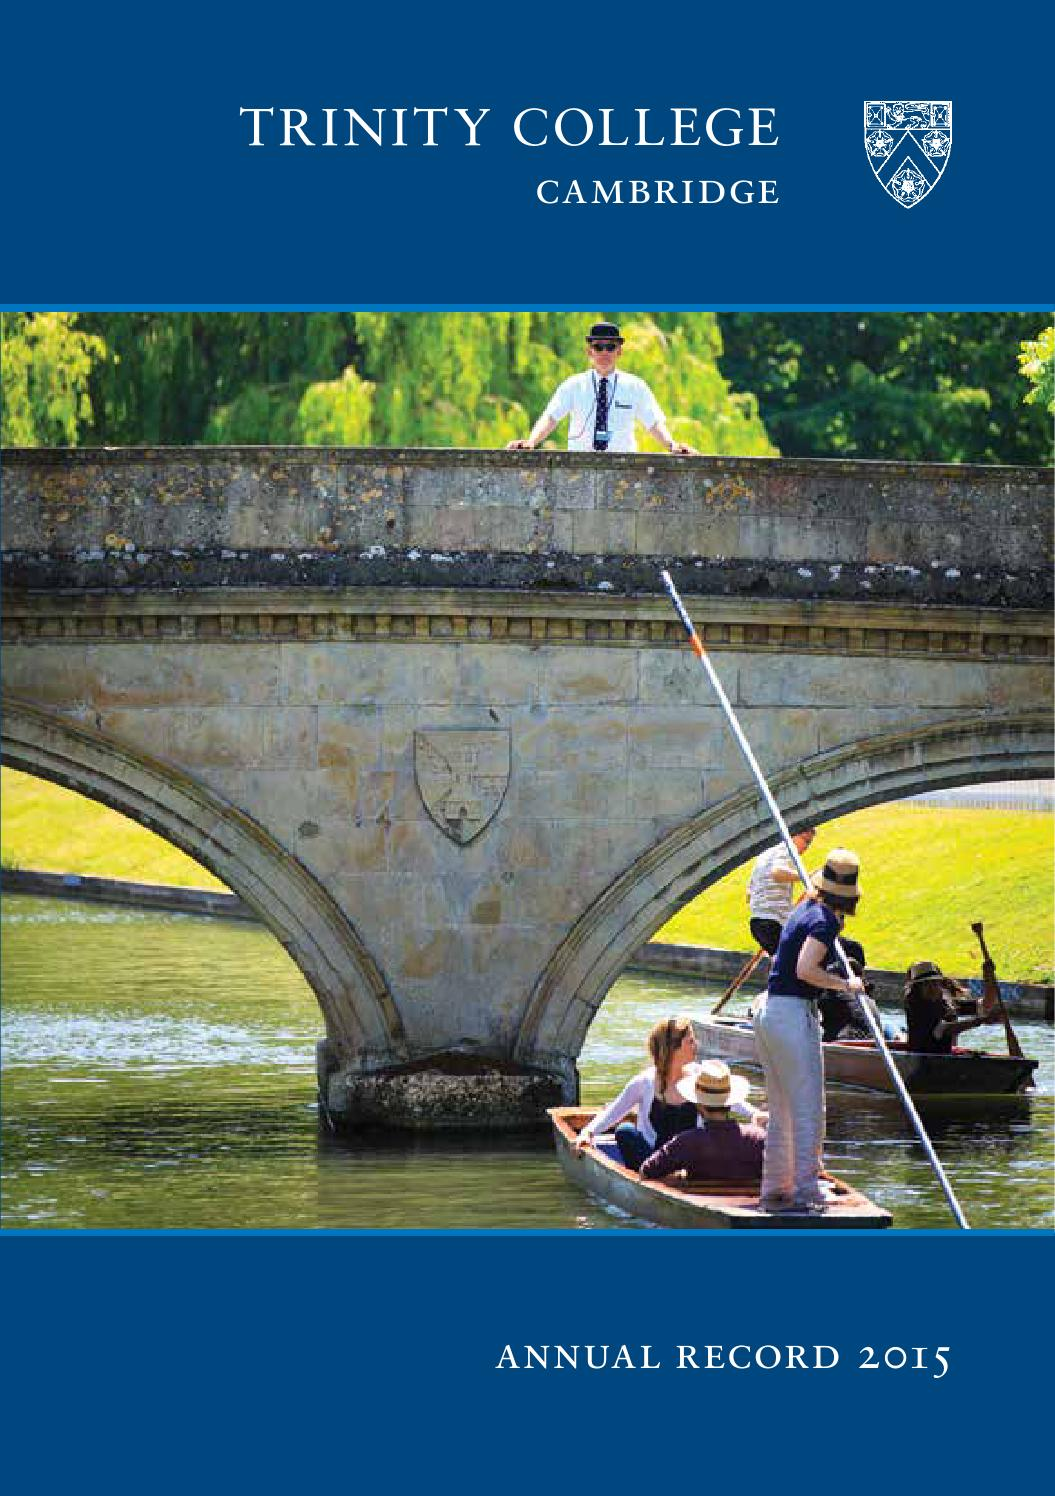 Annual Record - 2015 by Trinity College Cambridge - issuu